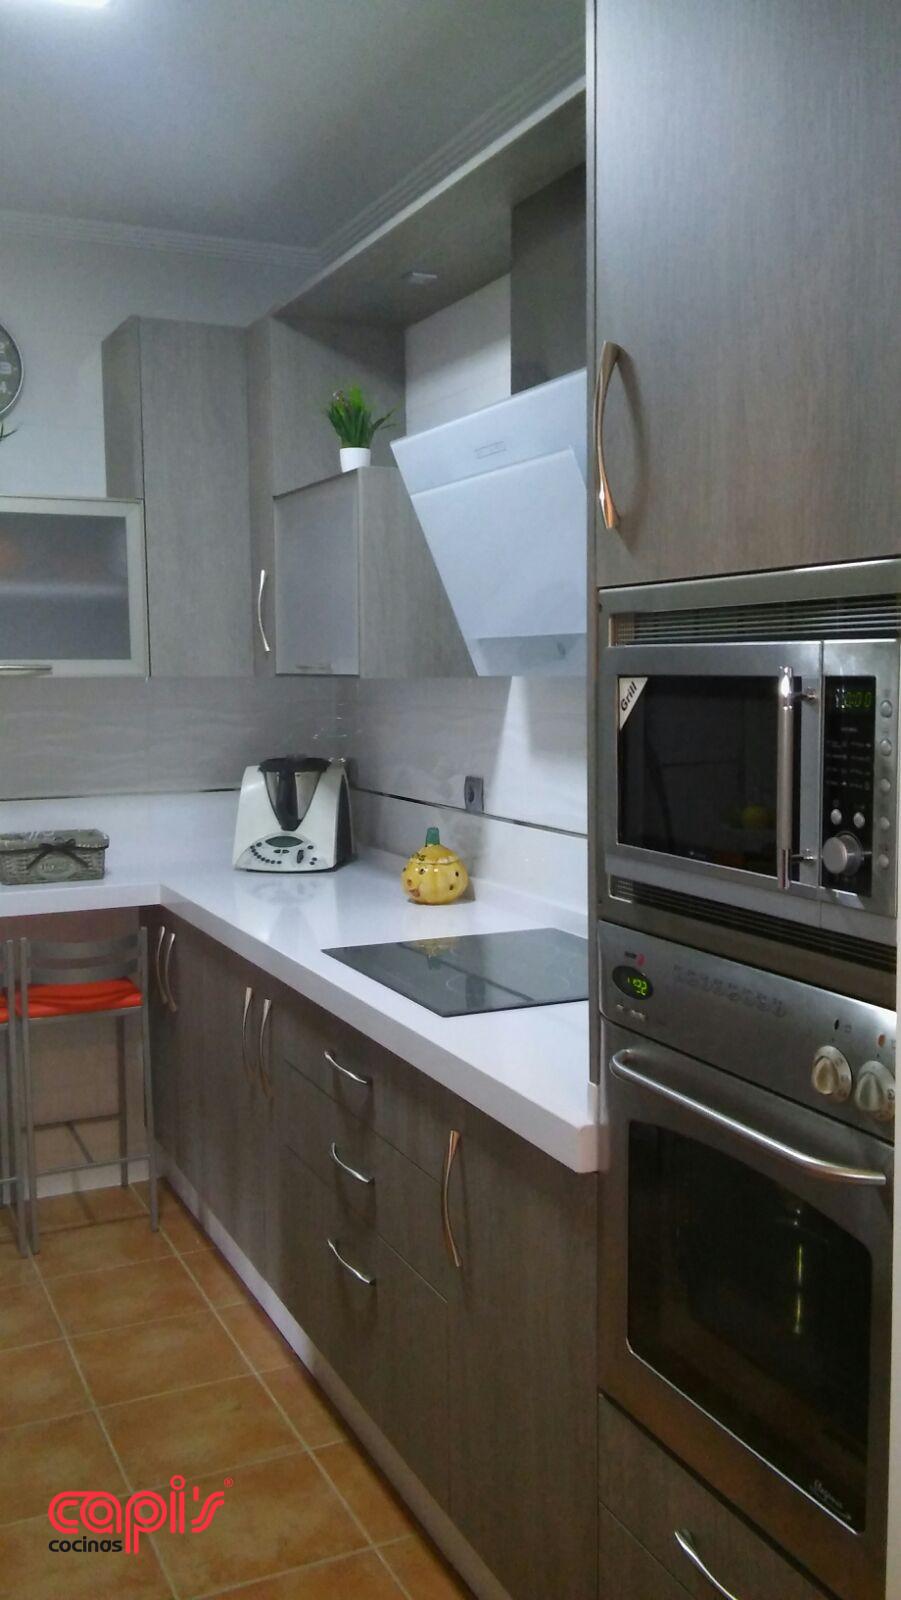 Cocina madera white storm cocinas capis dise o y - Cocinas en huelva ...